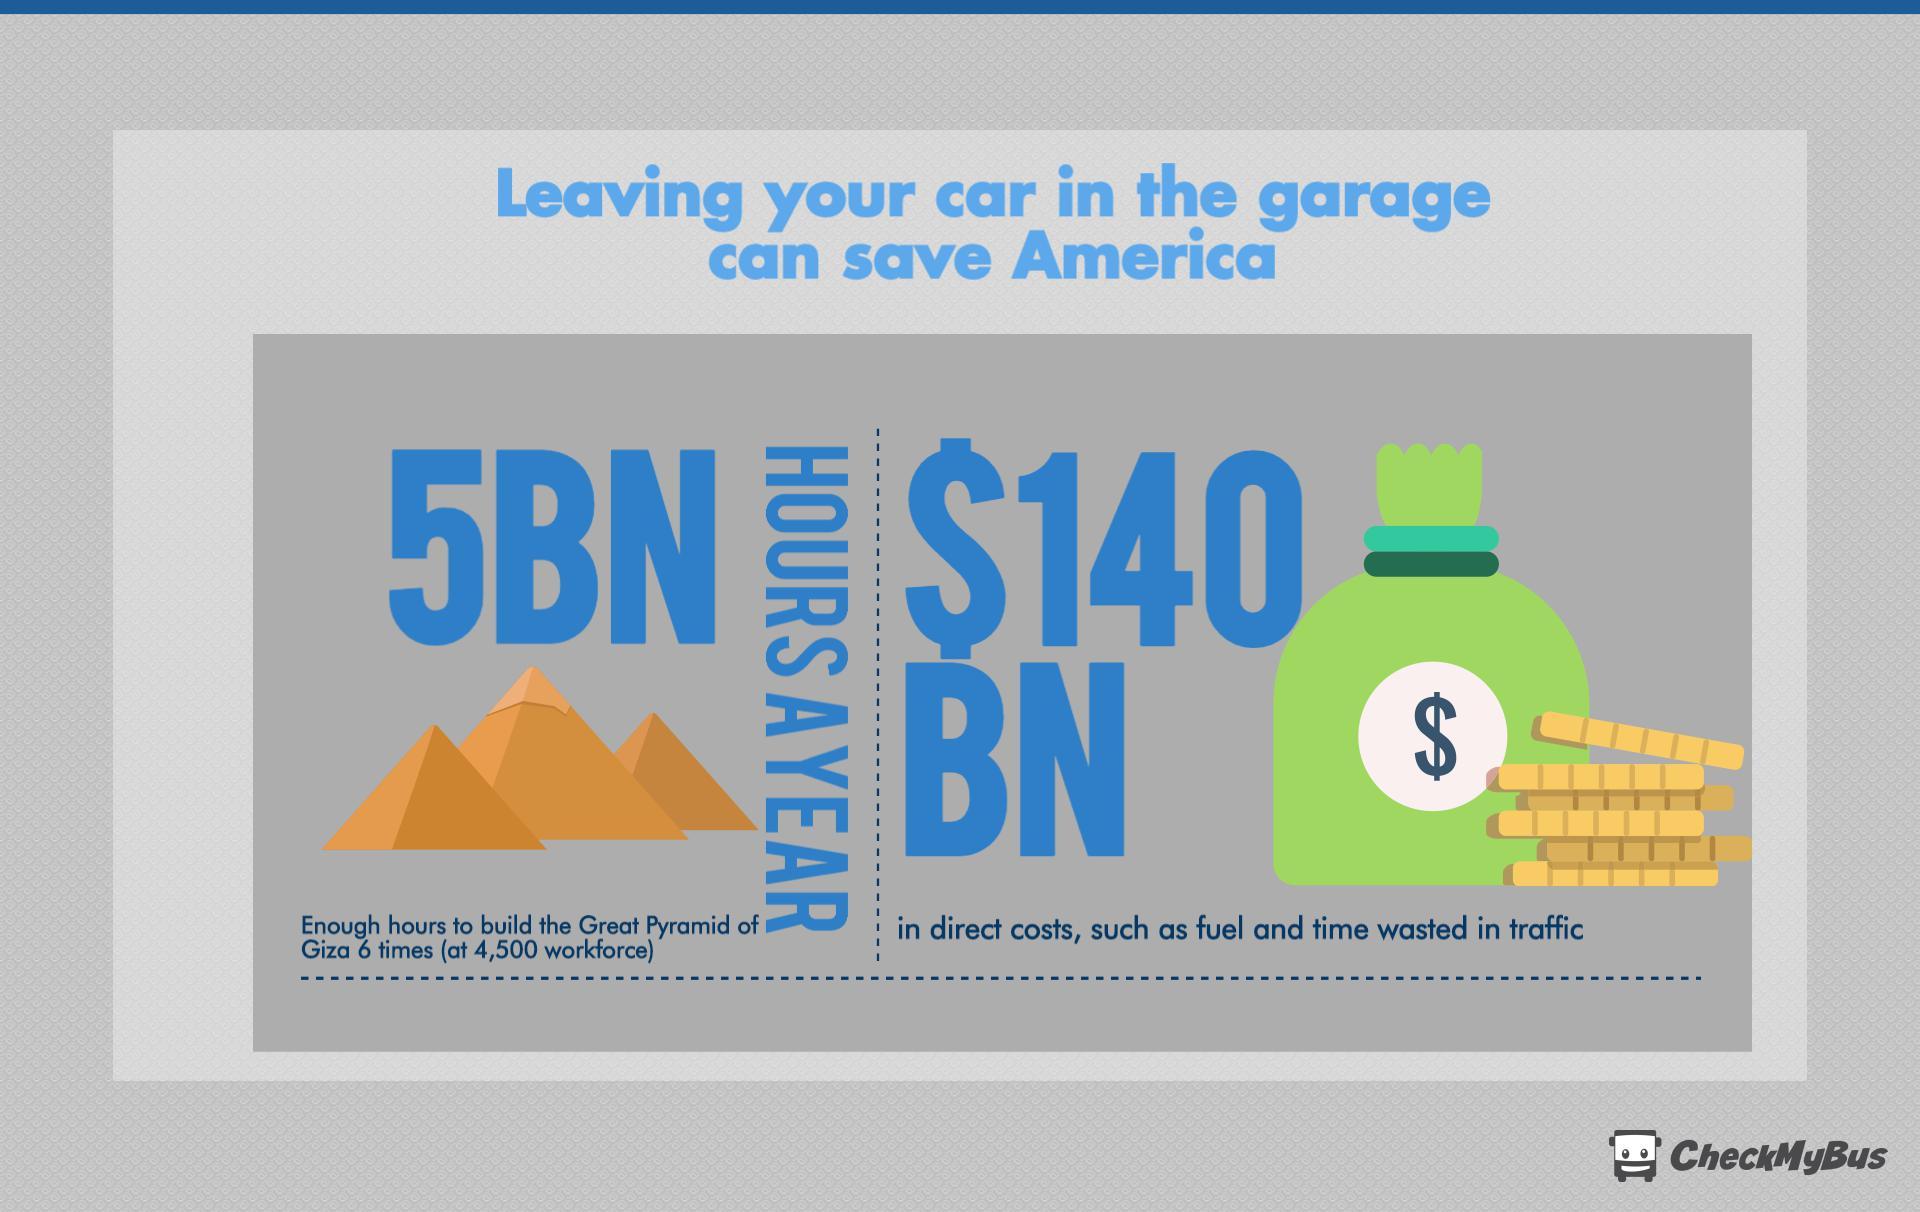 American commuters waste $140bn in traffic